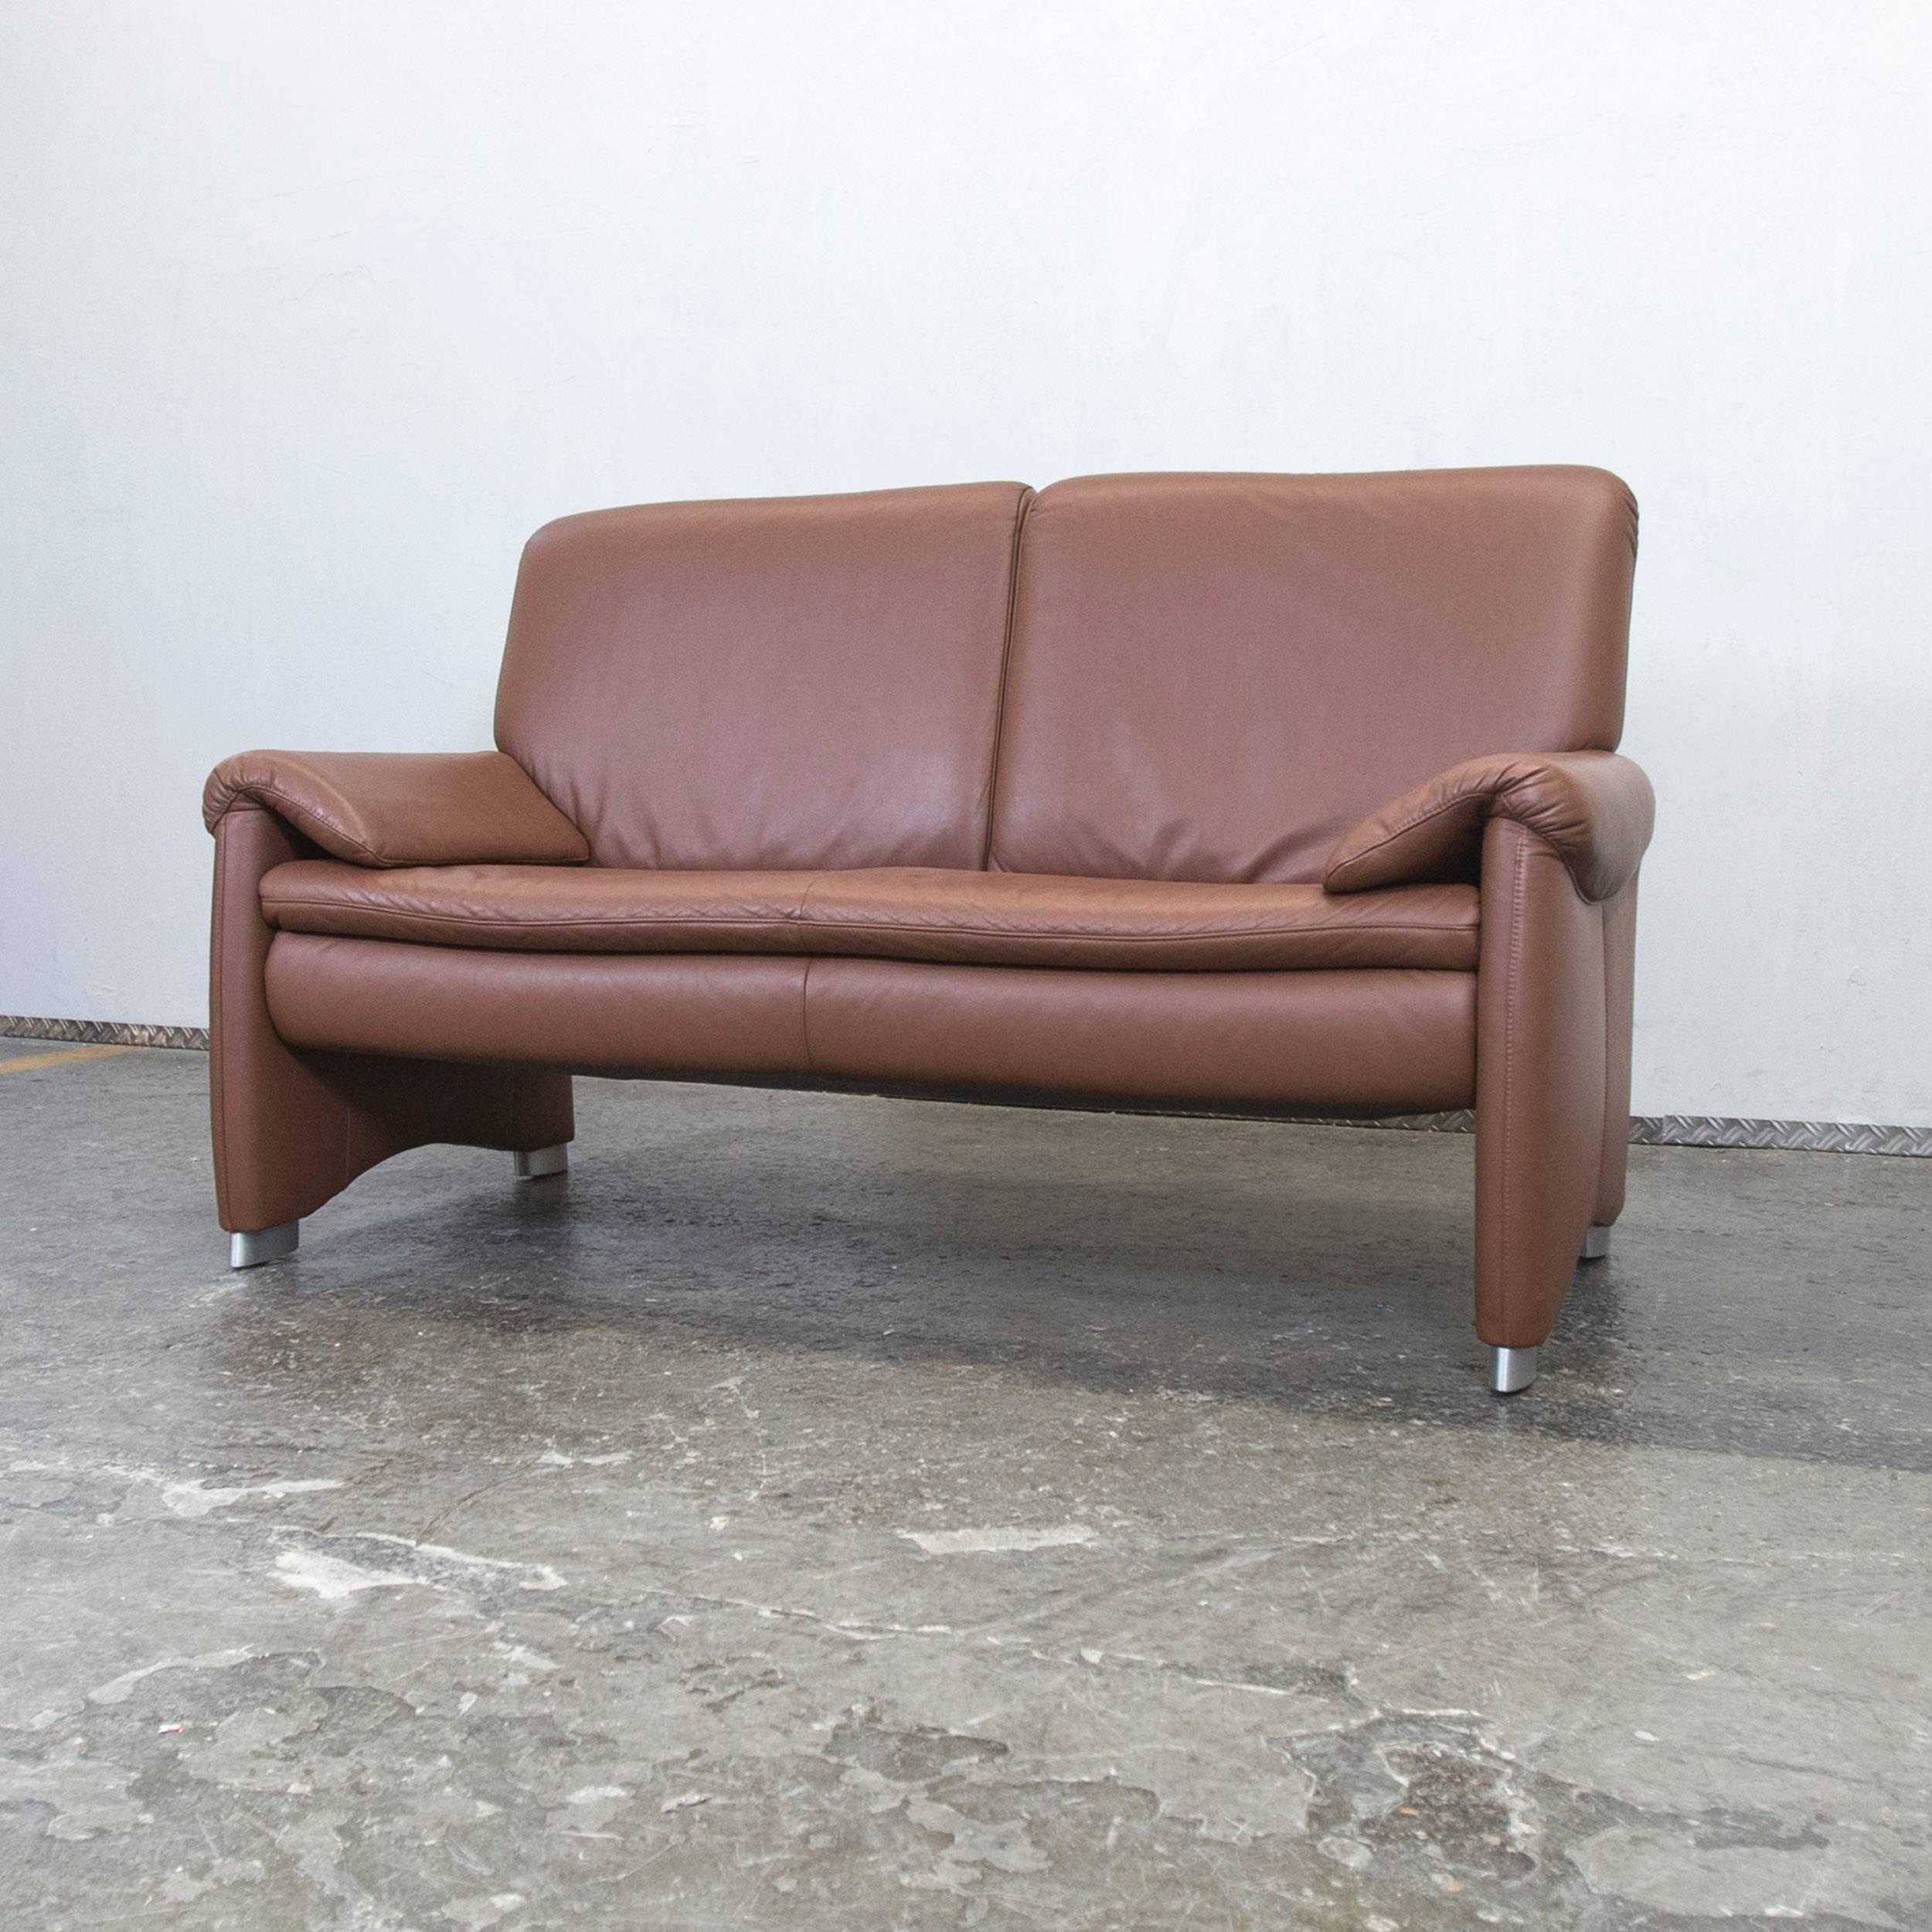 Uberlegen Brown Colored Hülsta Designer Sofa With A Modern Style, Designed For Pure  Comfort.